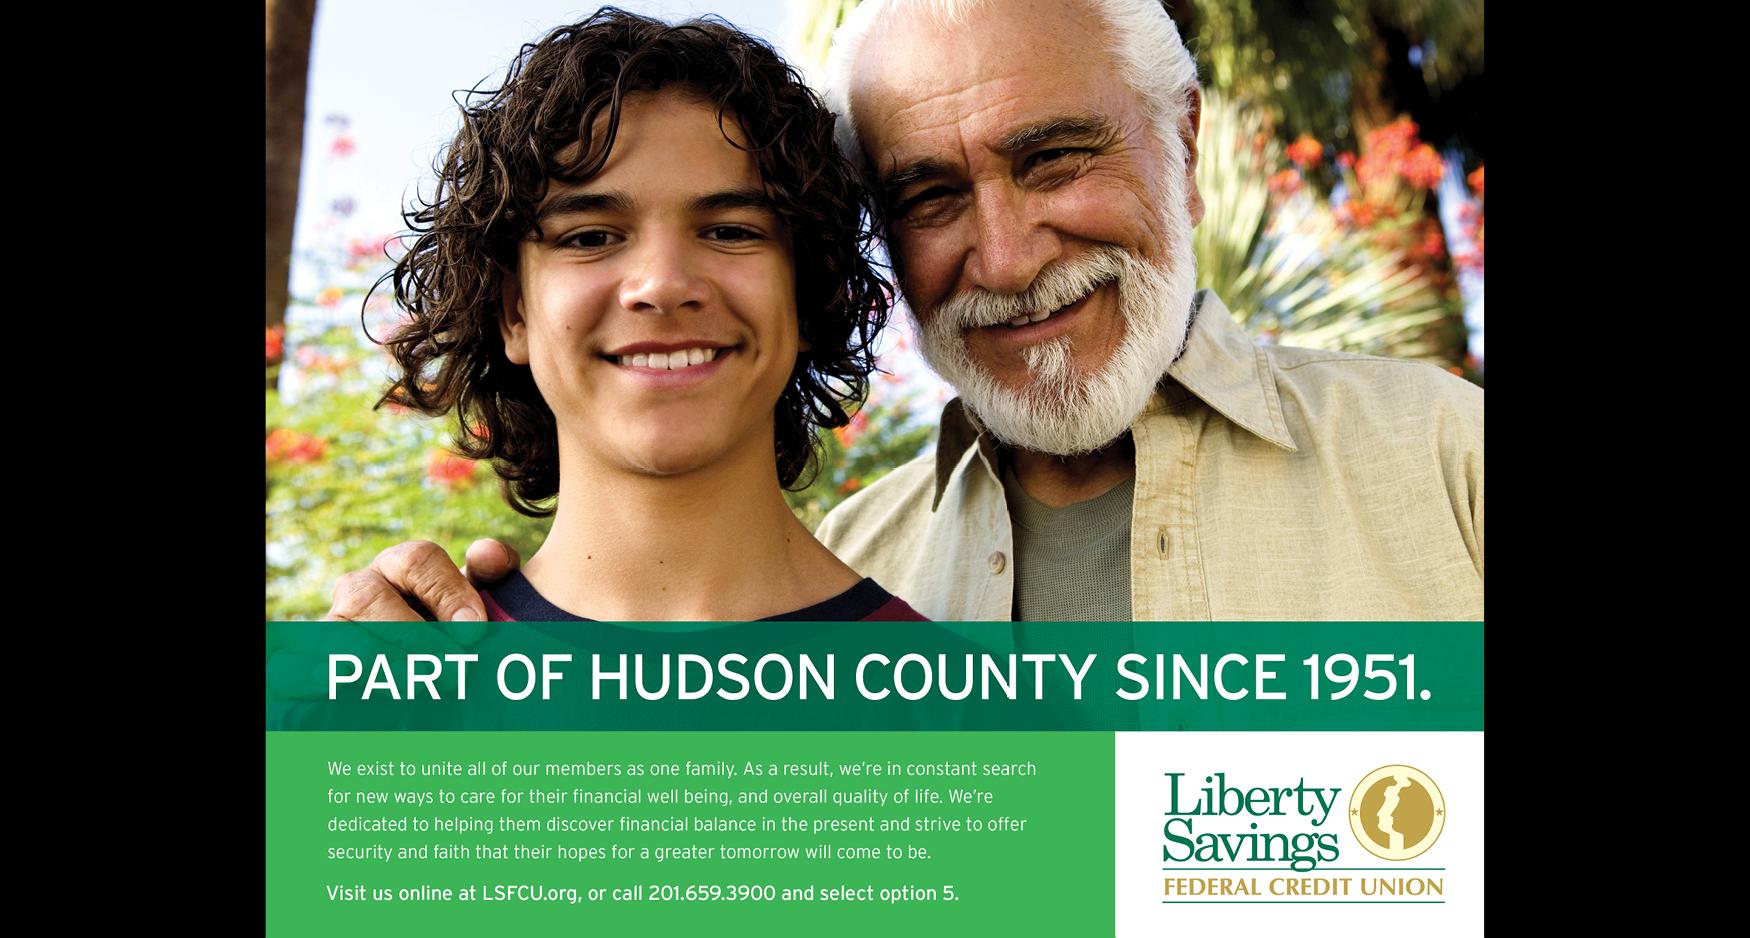 Hudson - LIBERTY SAVINGS - NEIGHBORHOOD SPIRIT CAMPAIGN